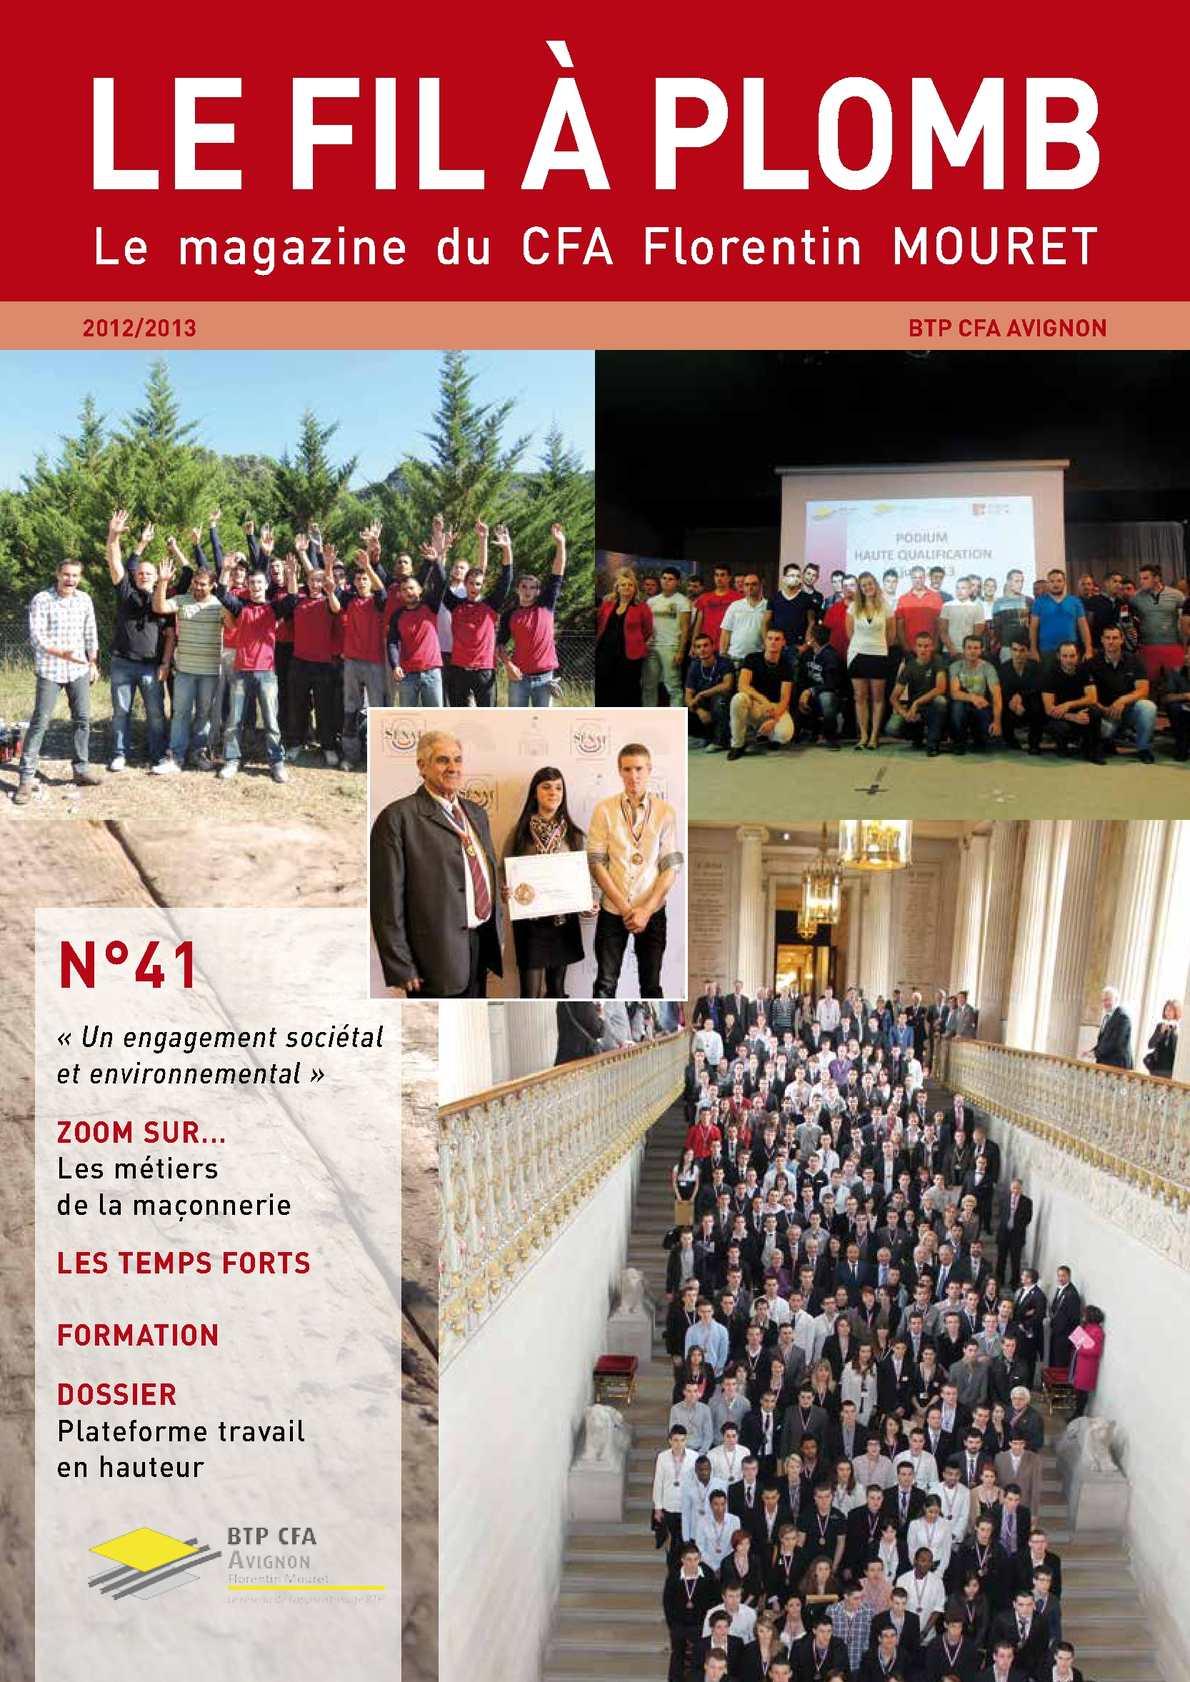 Calaméo magazine FILAPLOMB de BTP CFA Avignon Florentin Mouret n°21